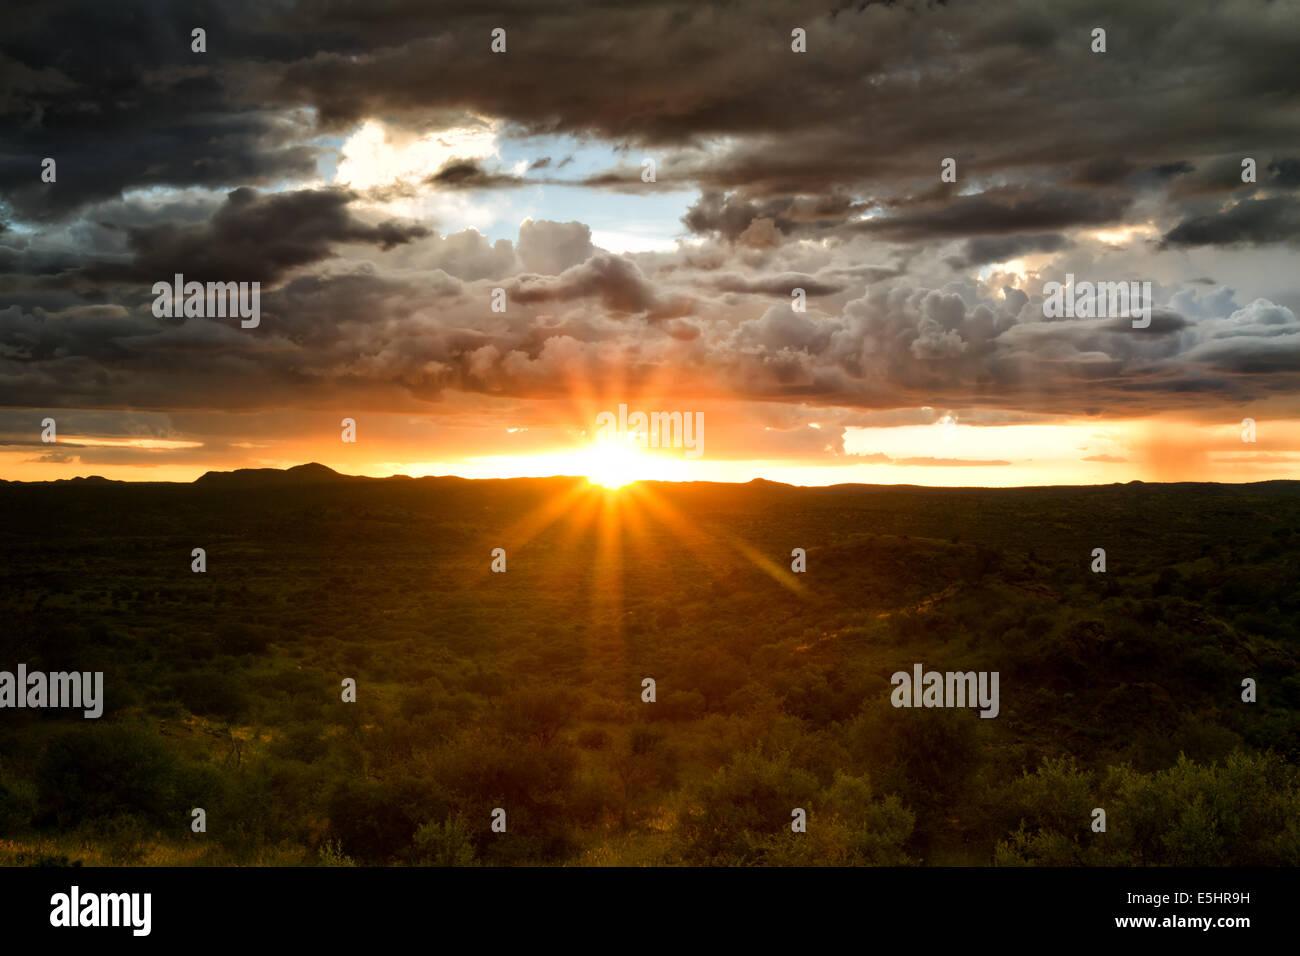 Sunset behind a thunderstorm, Savannah near Windhoek, Namibia - Stock Image